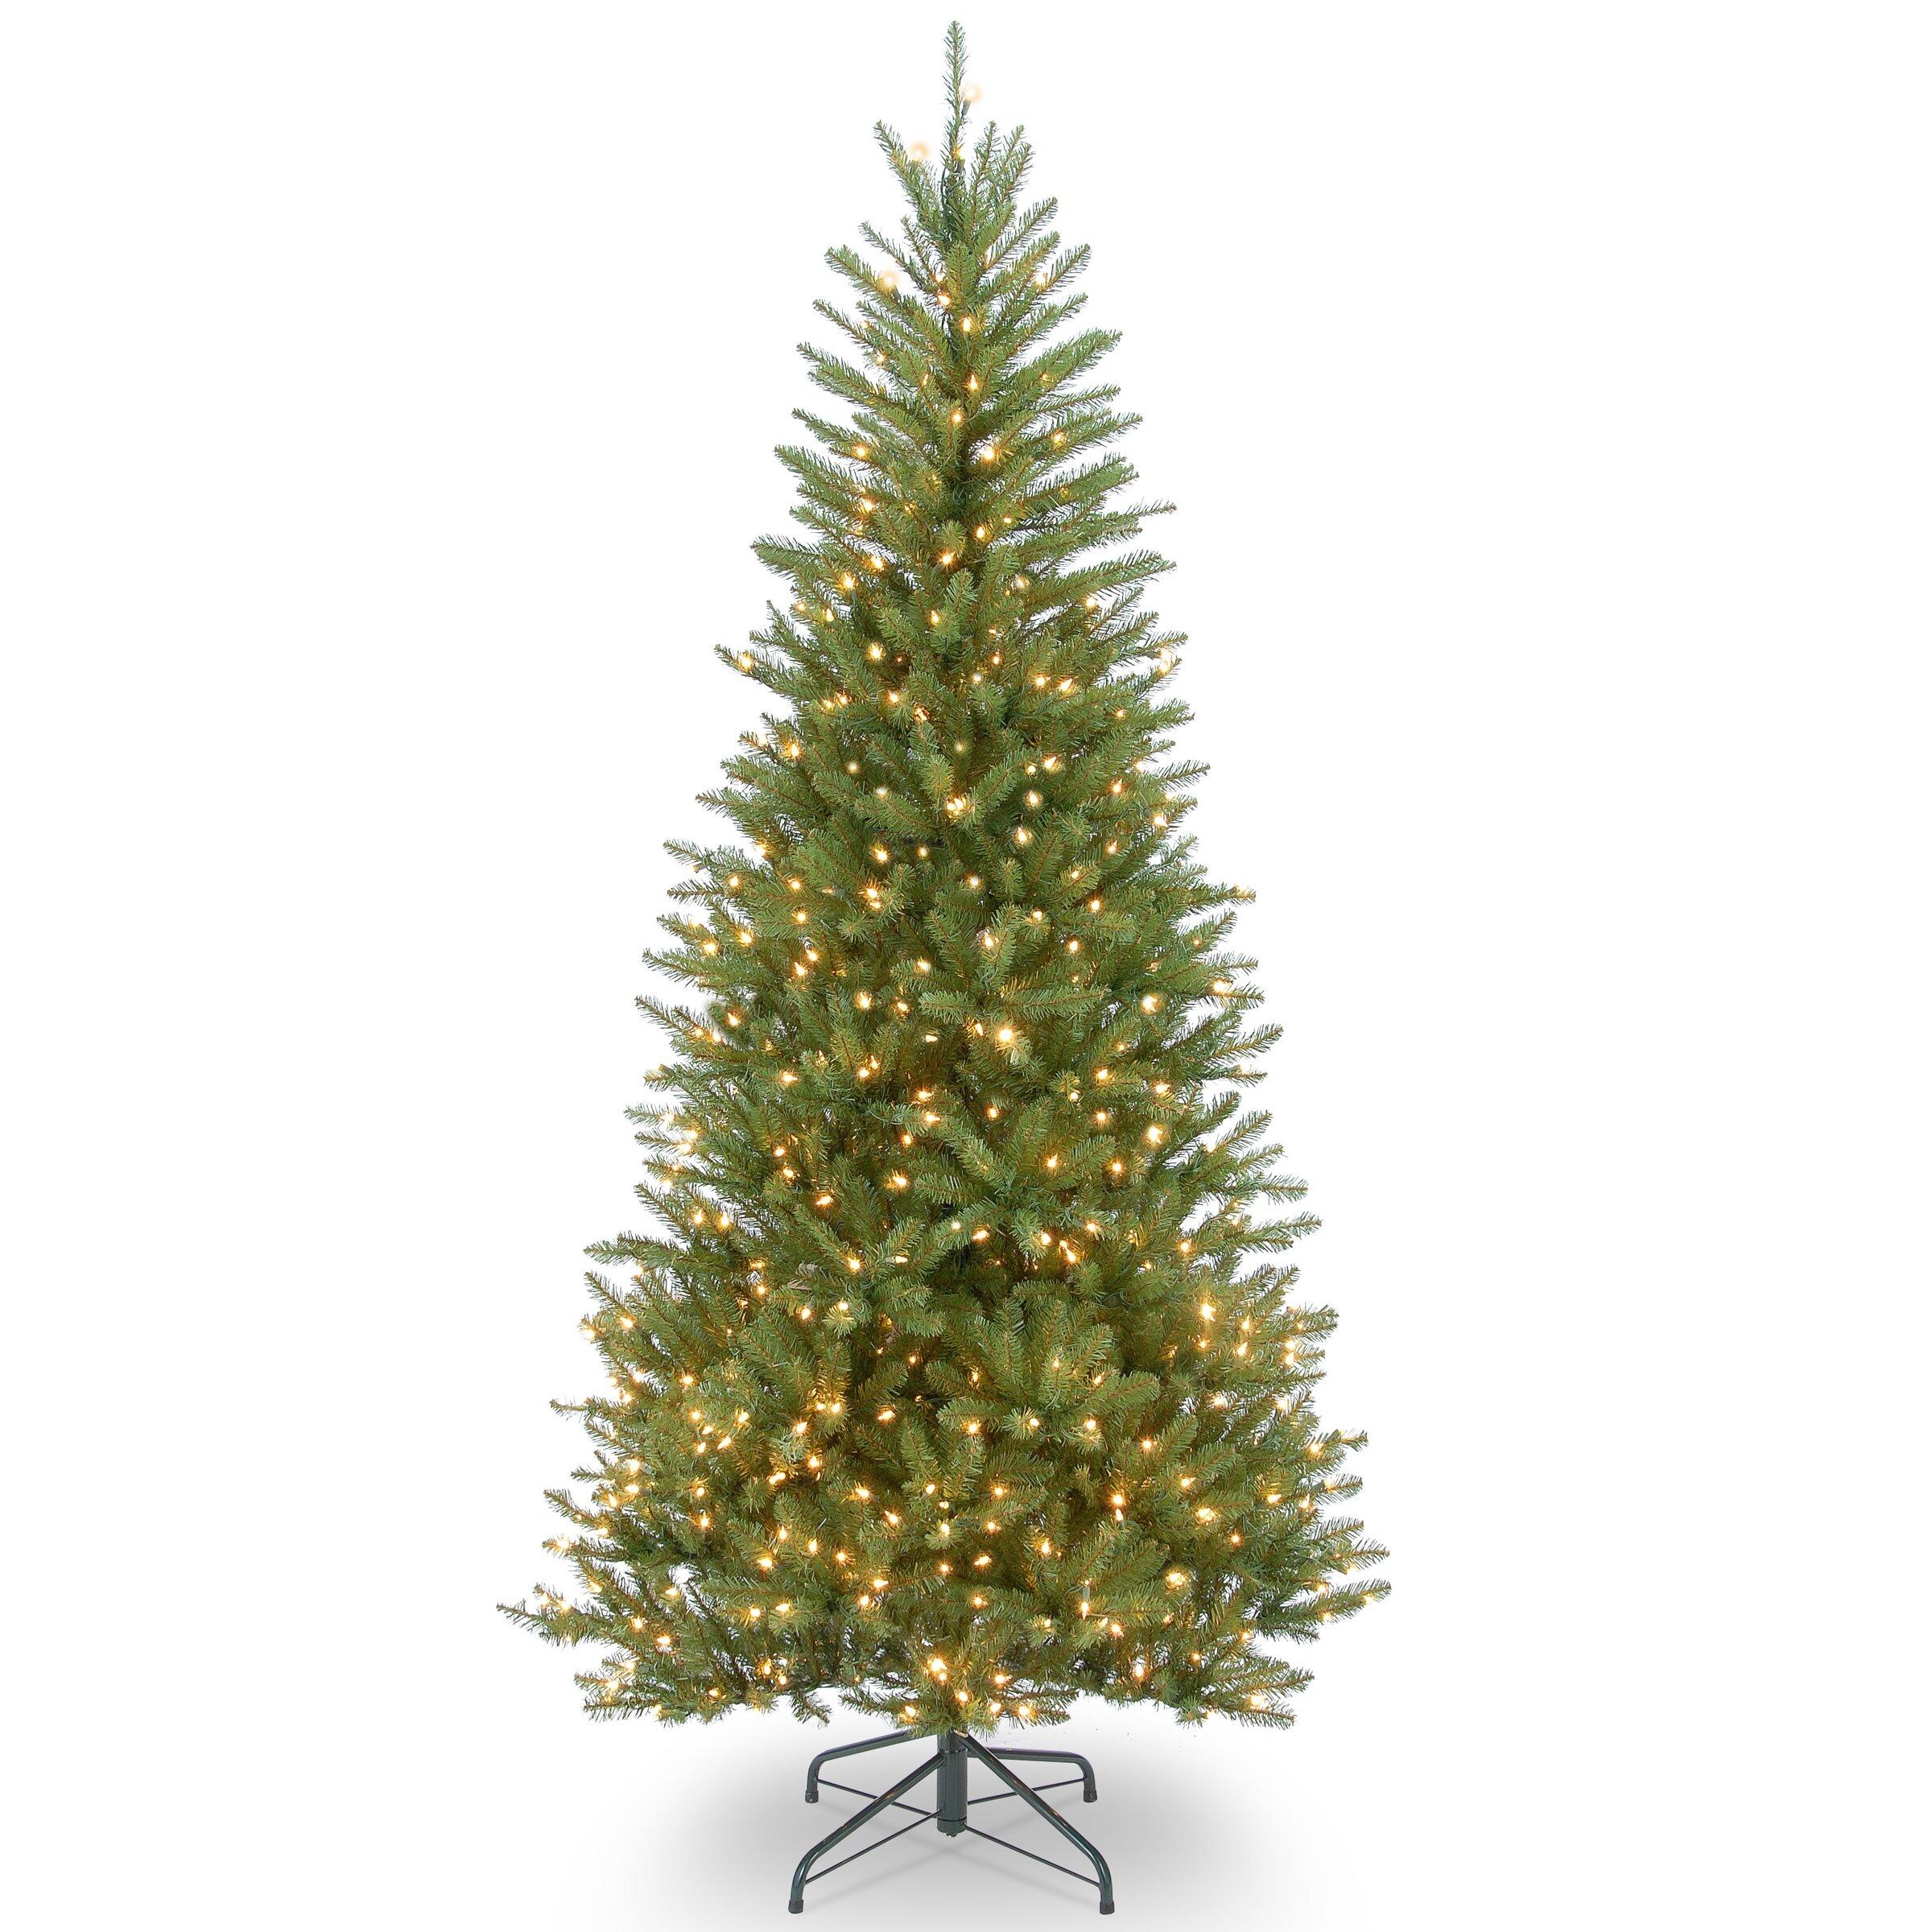 Next Slim Christmas Tree: Dunhill Slim Fir 7.5' Hinged Green Artificial Christmas